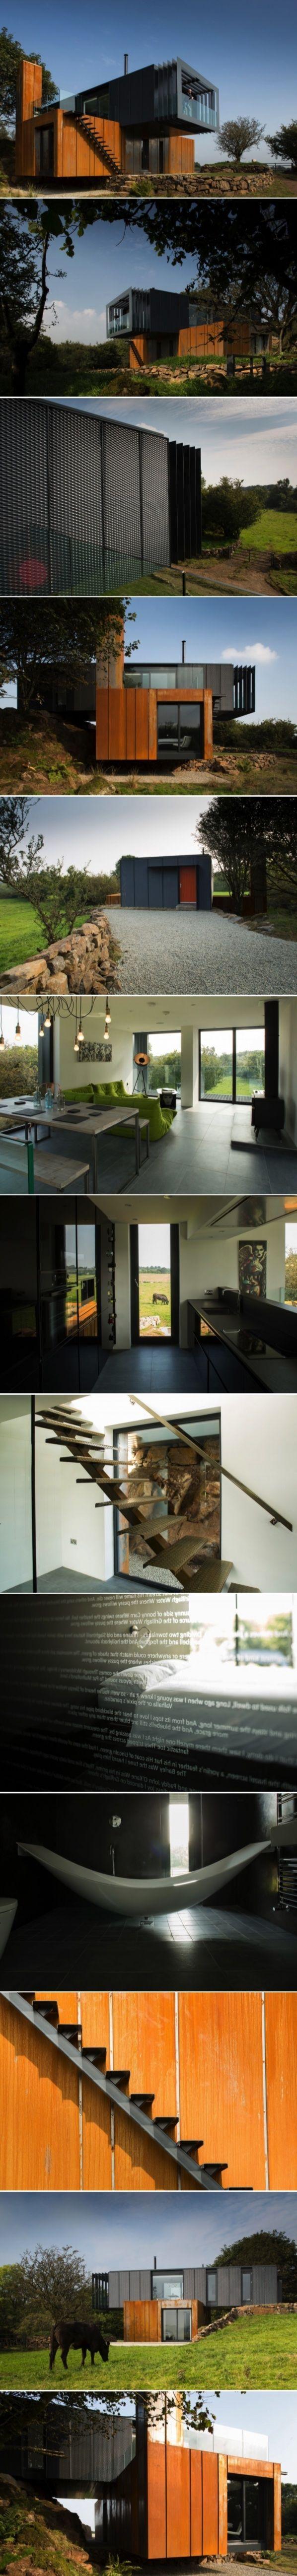 best architecture u design images on pinterest future house